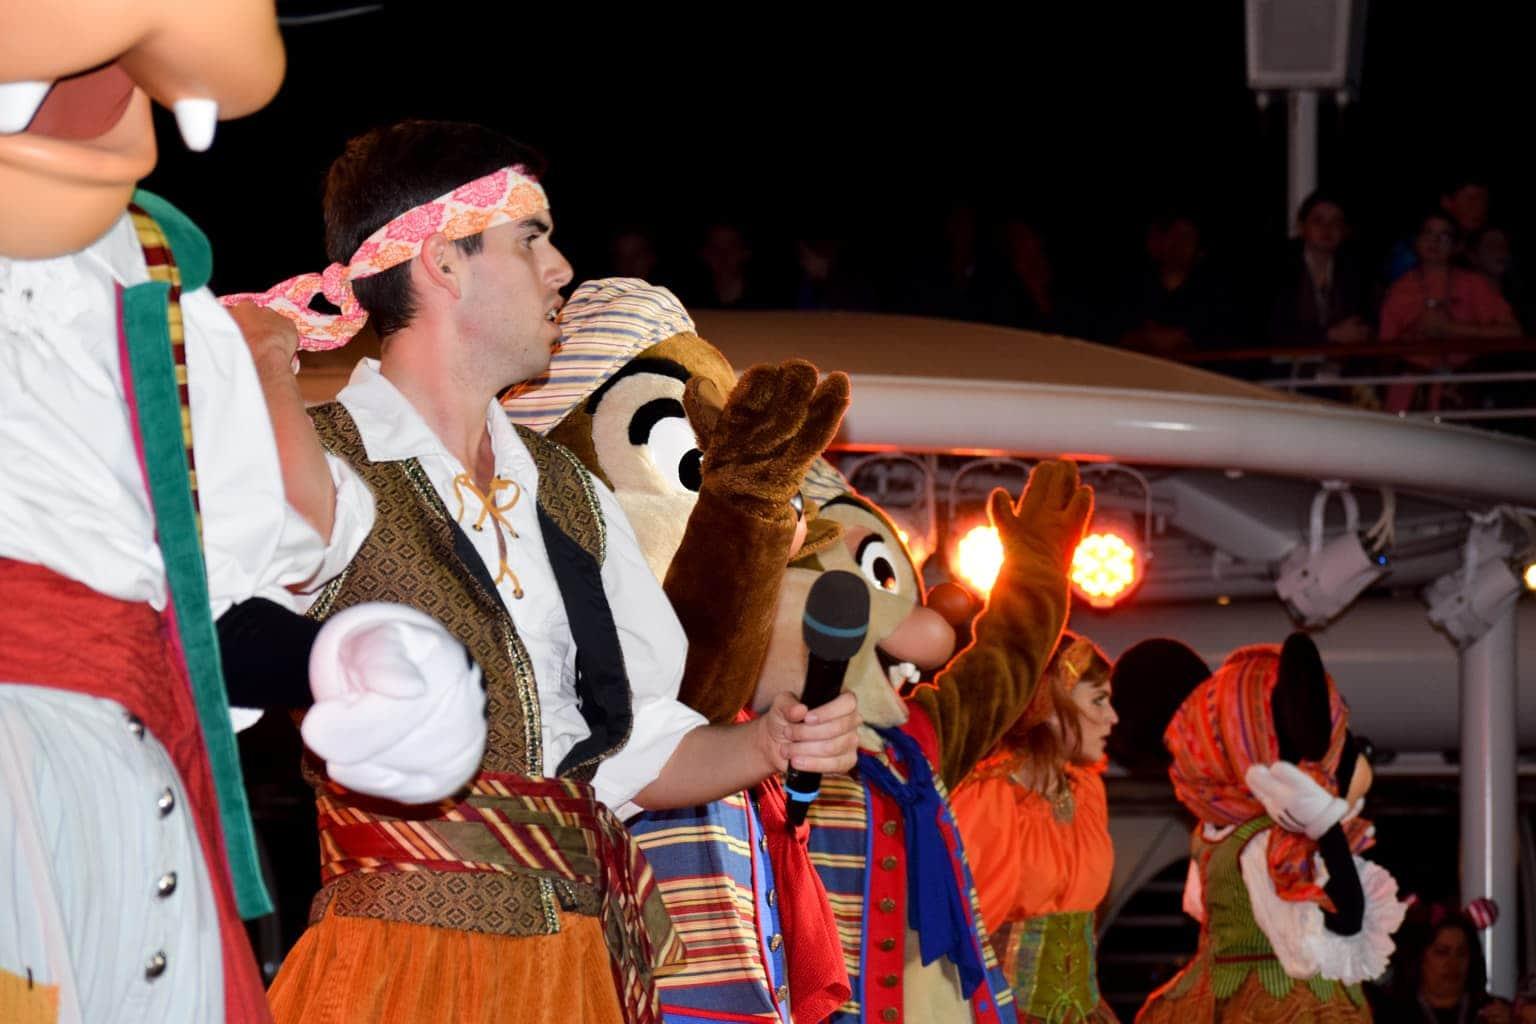 disney cruise pirate night, disney dream